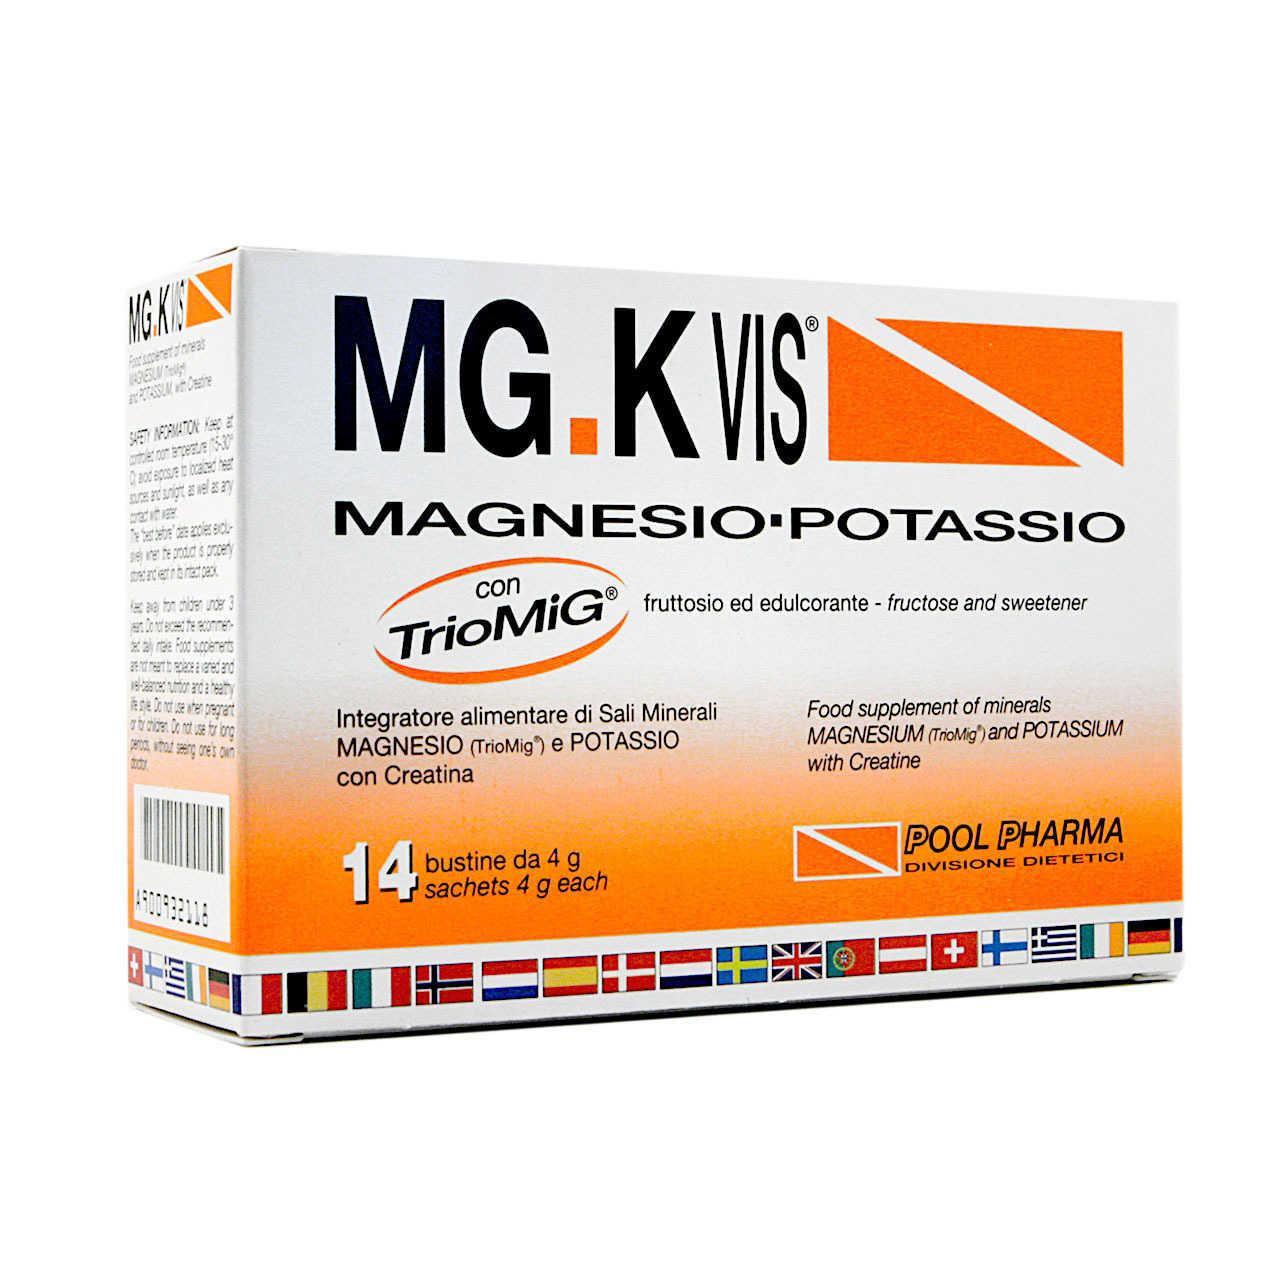 Mg-k Vis - Integratore con Creatina - 14 bustine